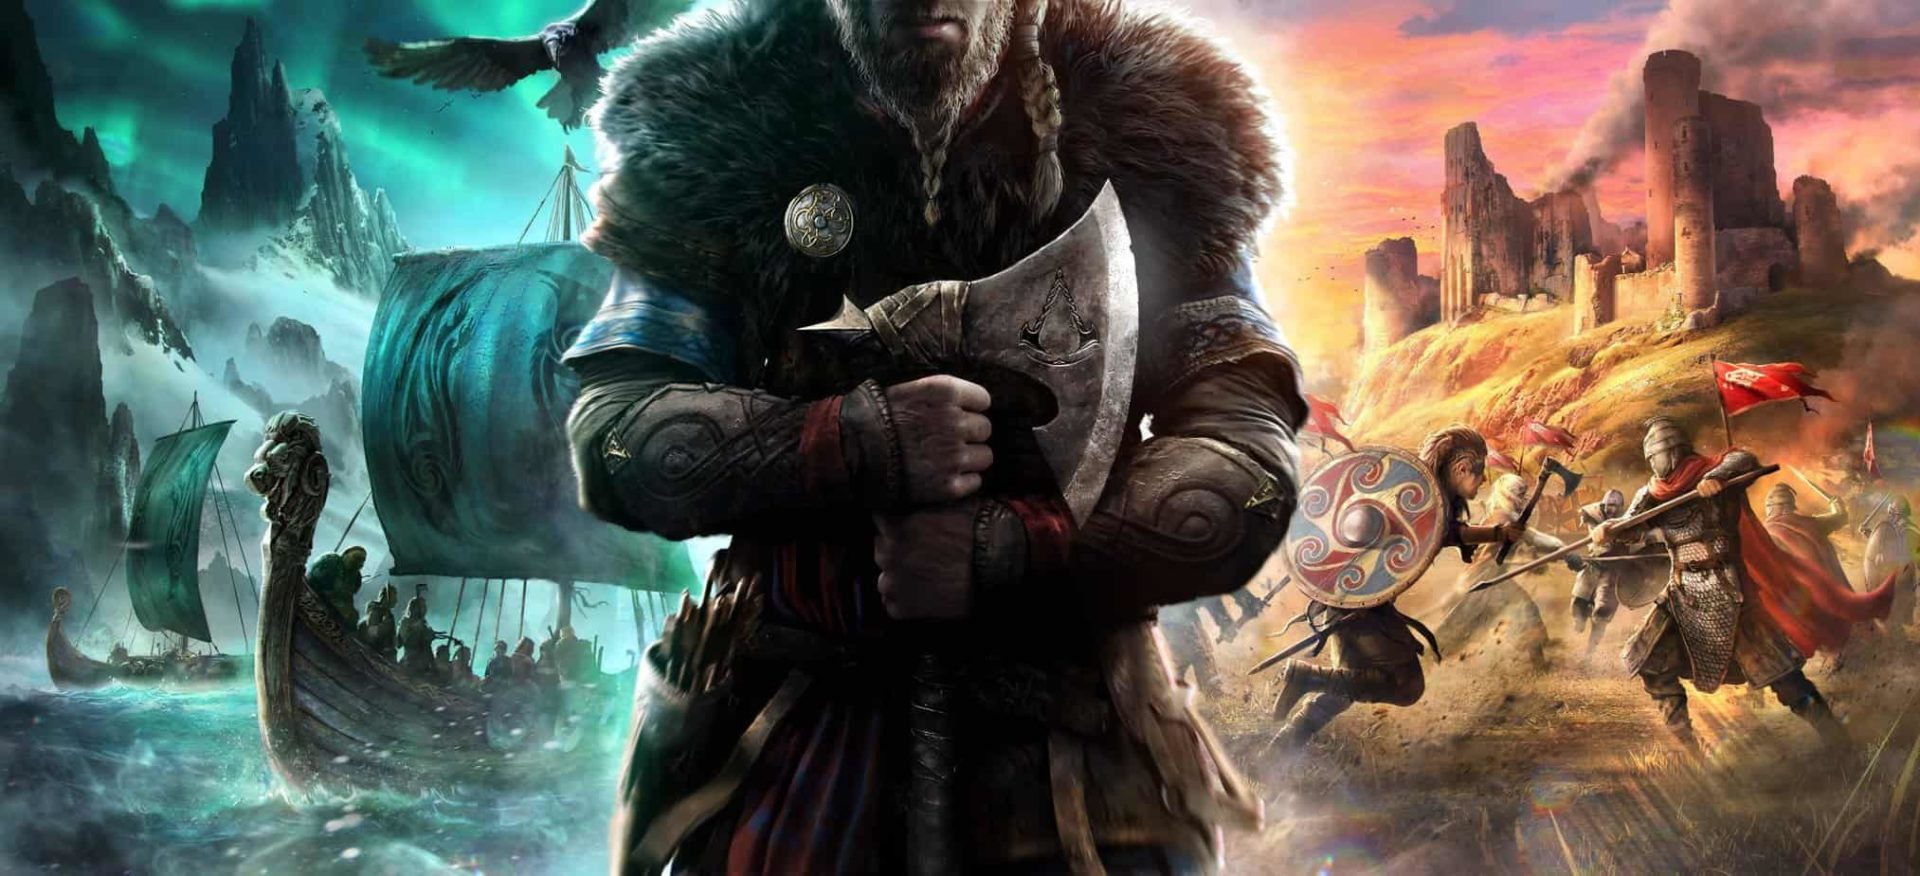 assassin's creed valhalla lore (2)